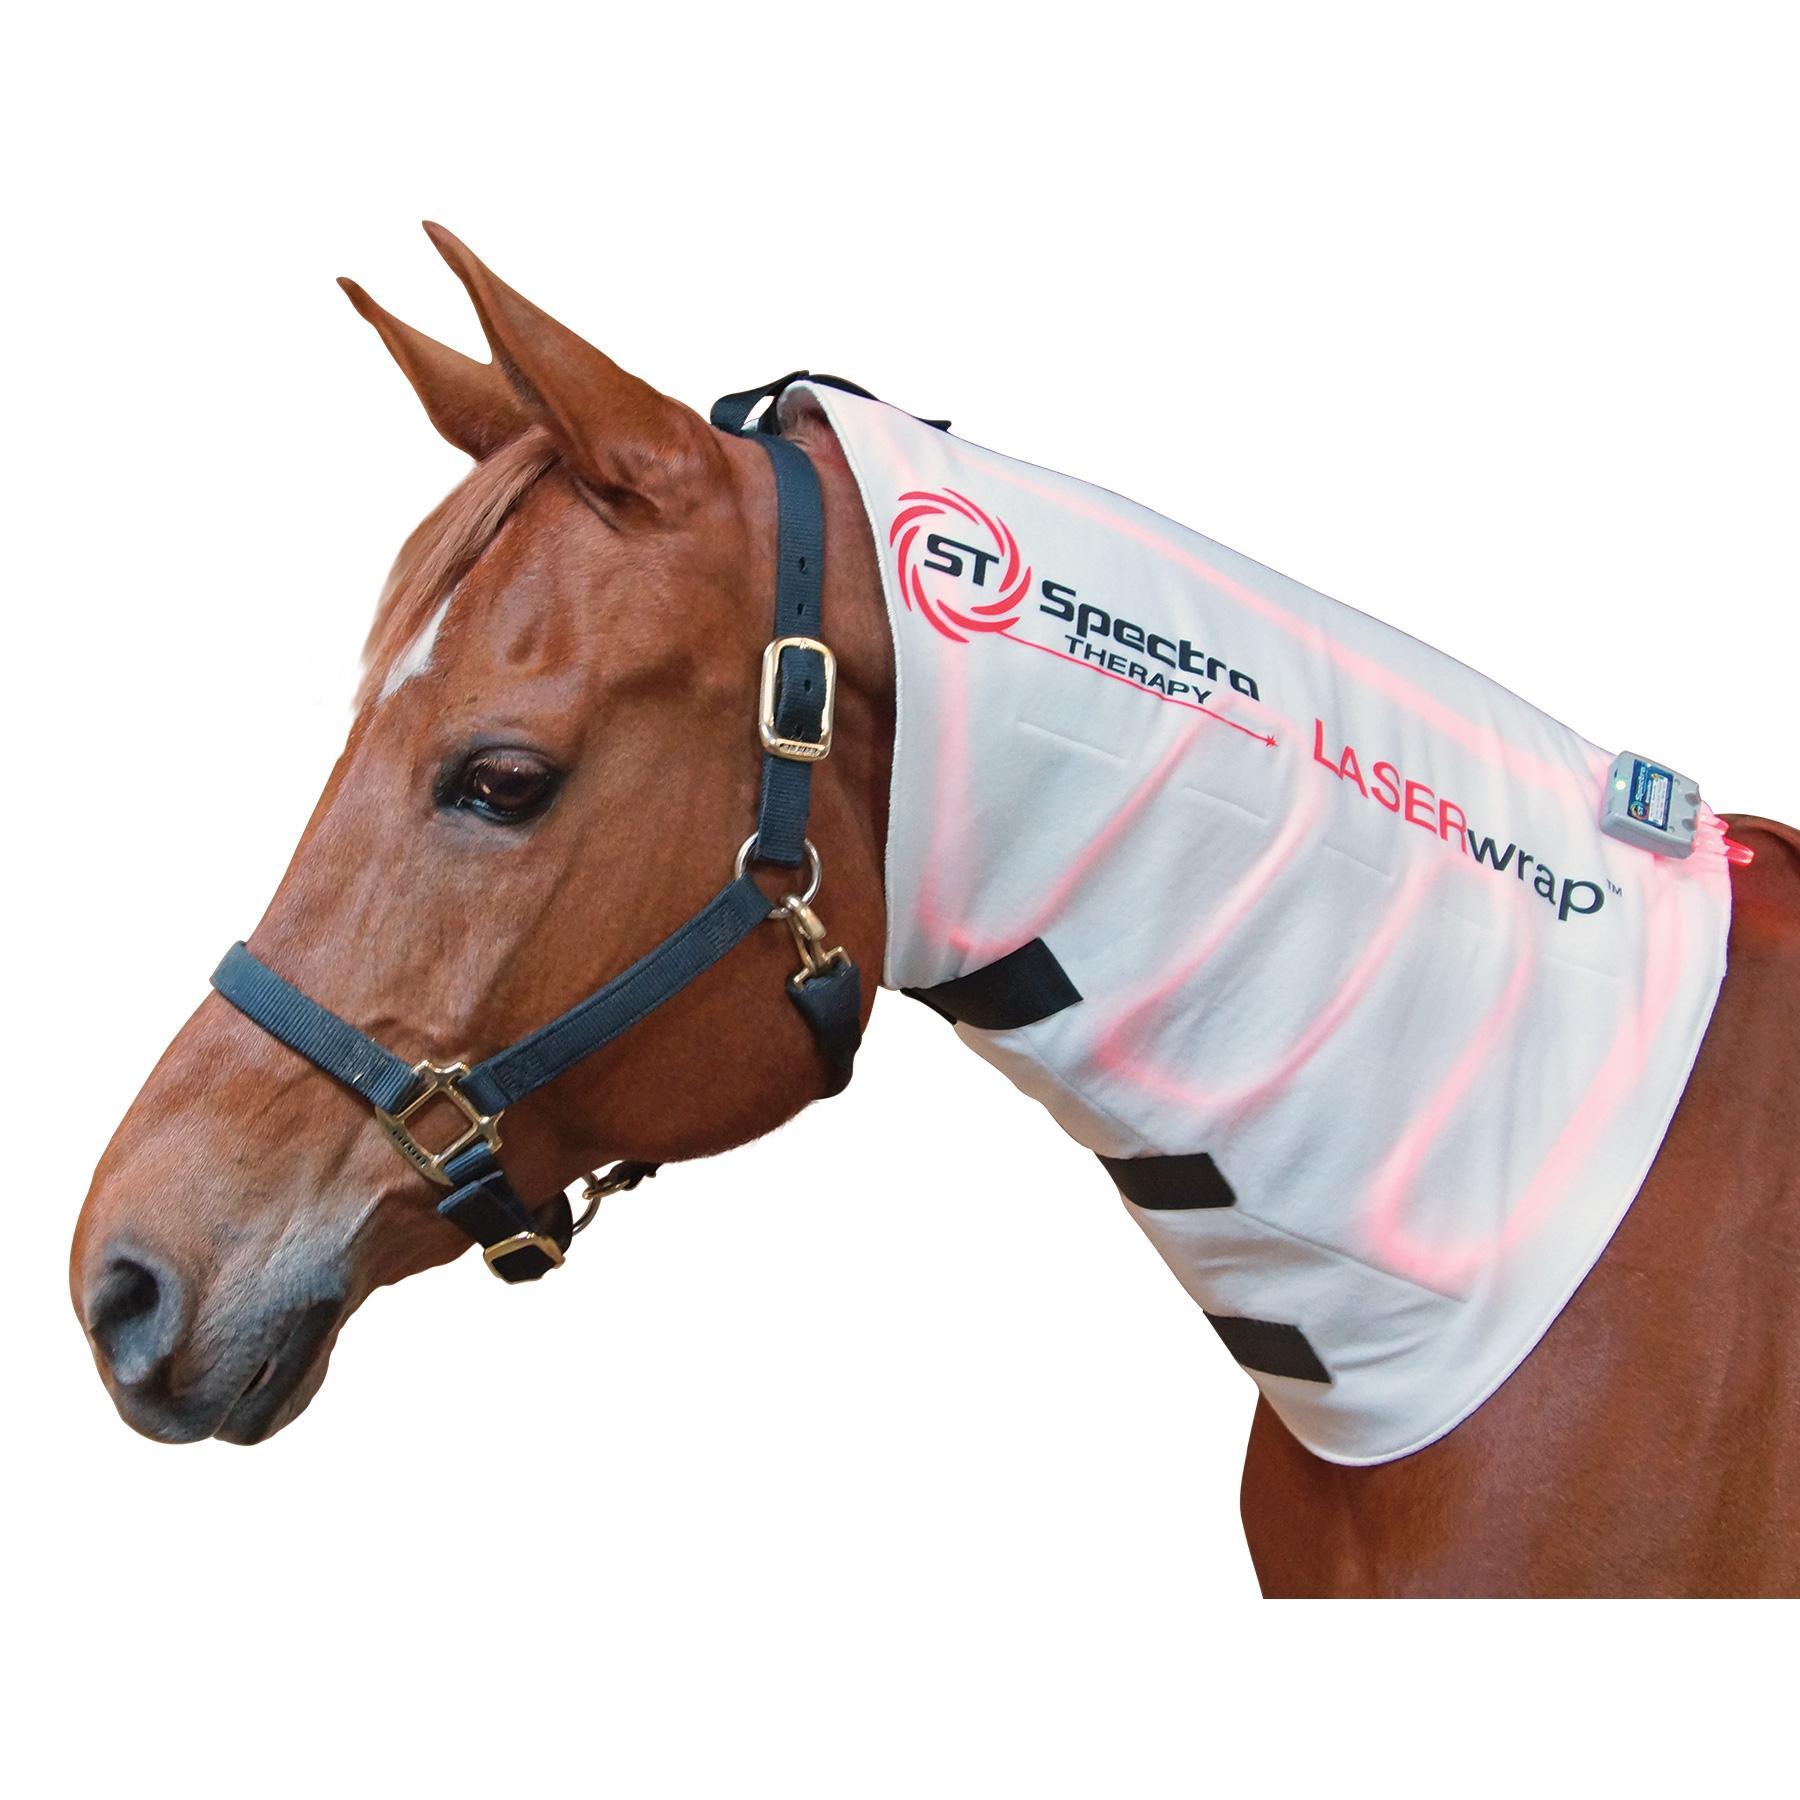 ai37446 Wearable LASERwrap™ - Neck Wrap